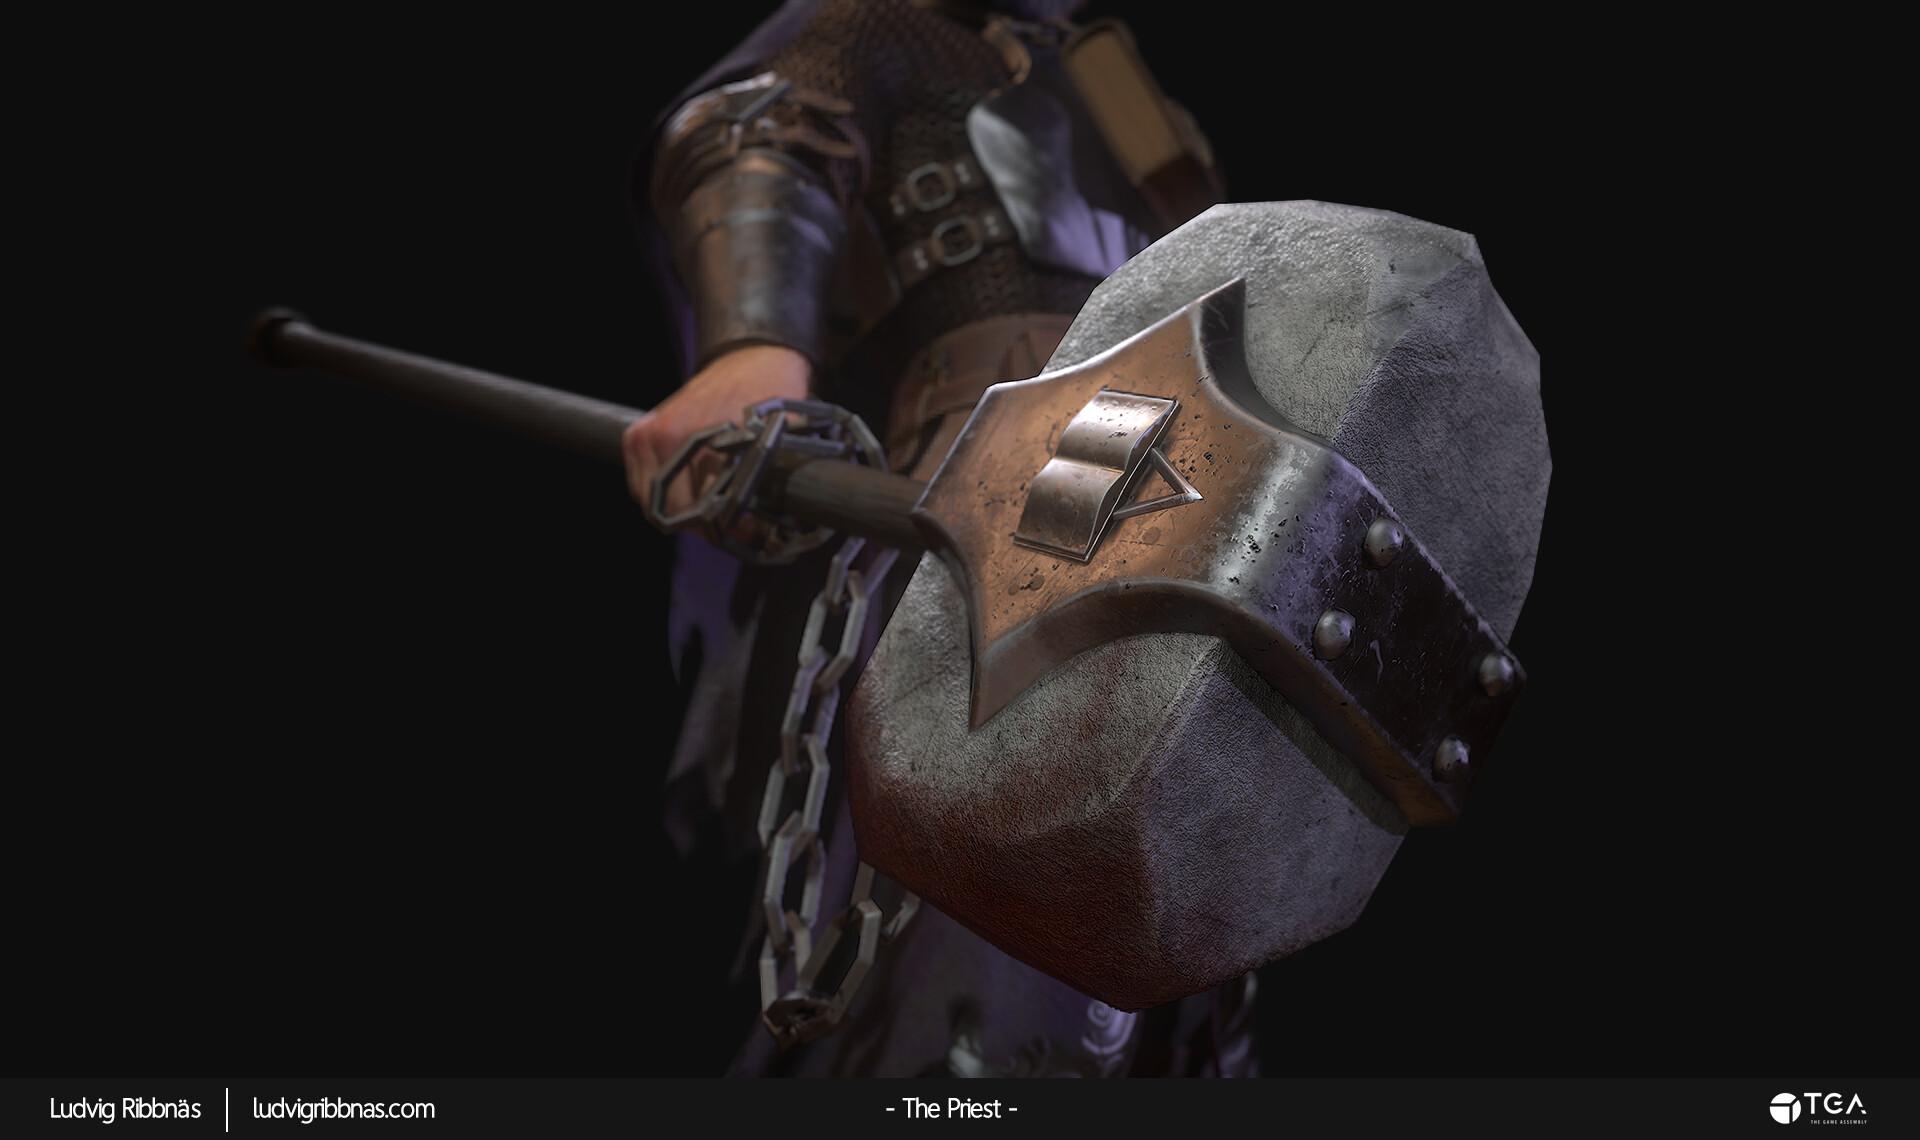 Ludvig ribbnas thepriest hammer